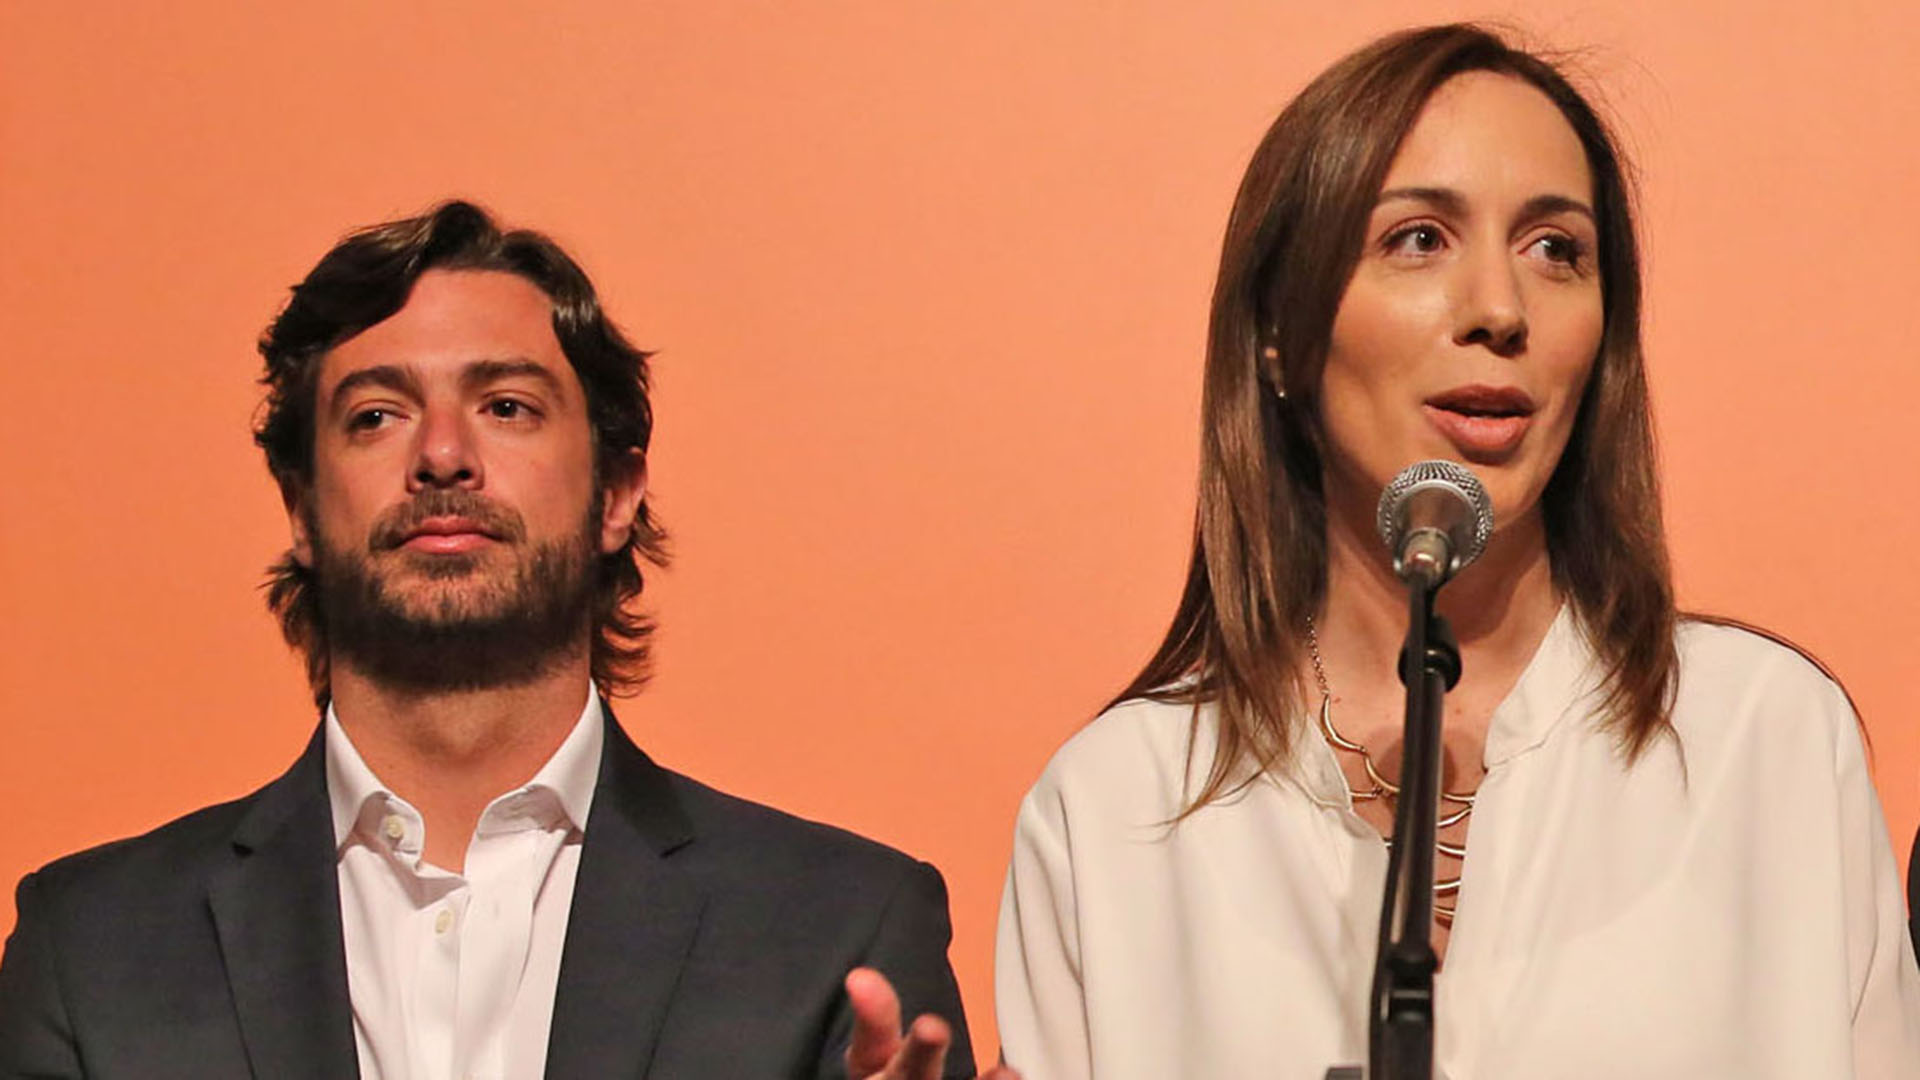 Federico Salvai junto a la gobernadora Vidal (Télam)